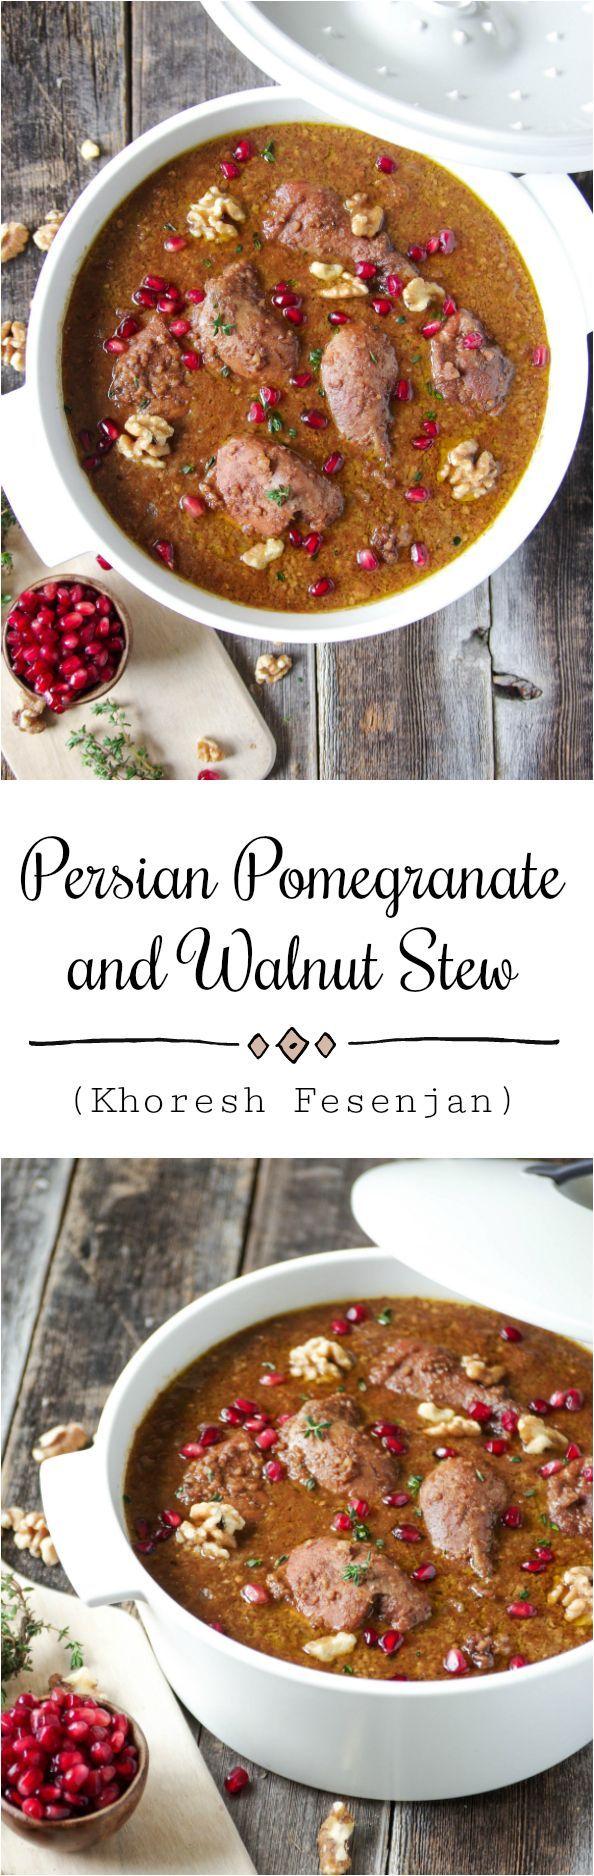 Persian Pomegranate and Walnut Stew (Khoresh Fesenjan ... Persian Pomegranate And Walnut Chicken Stew